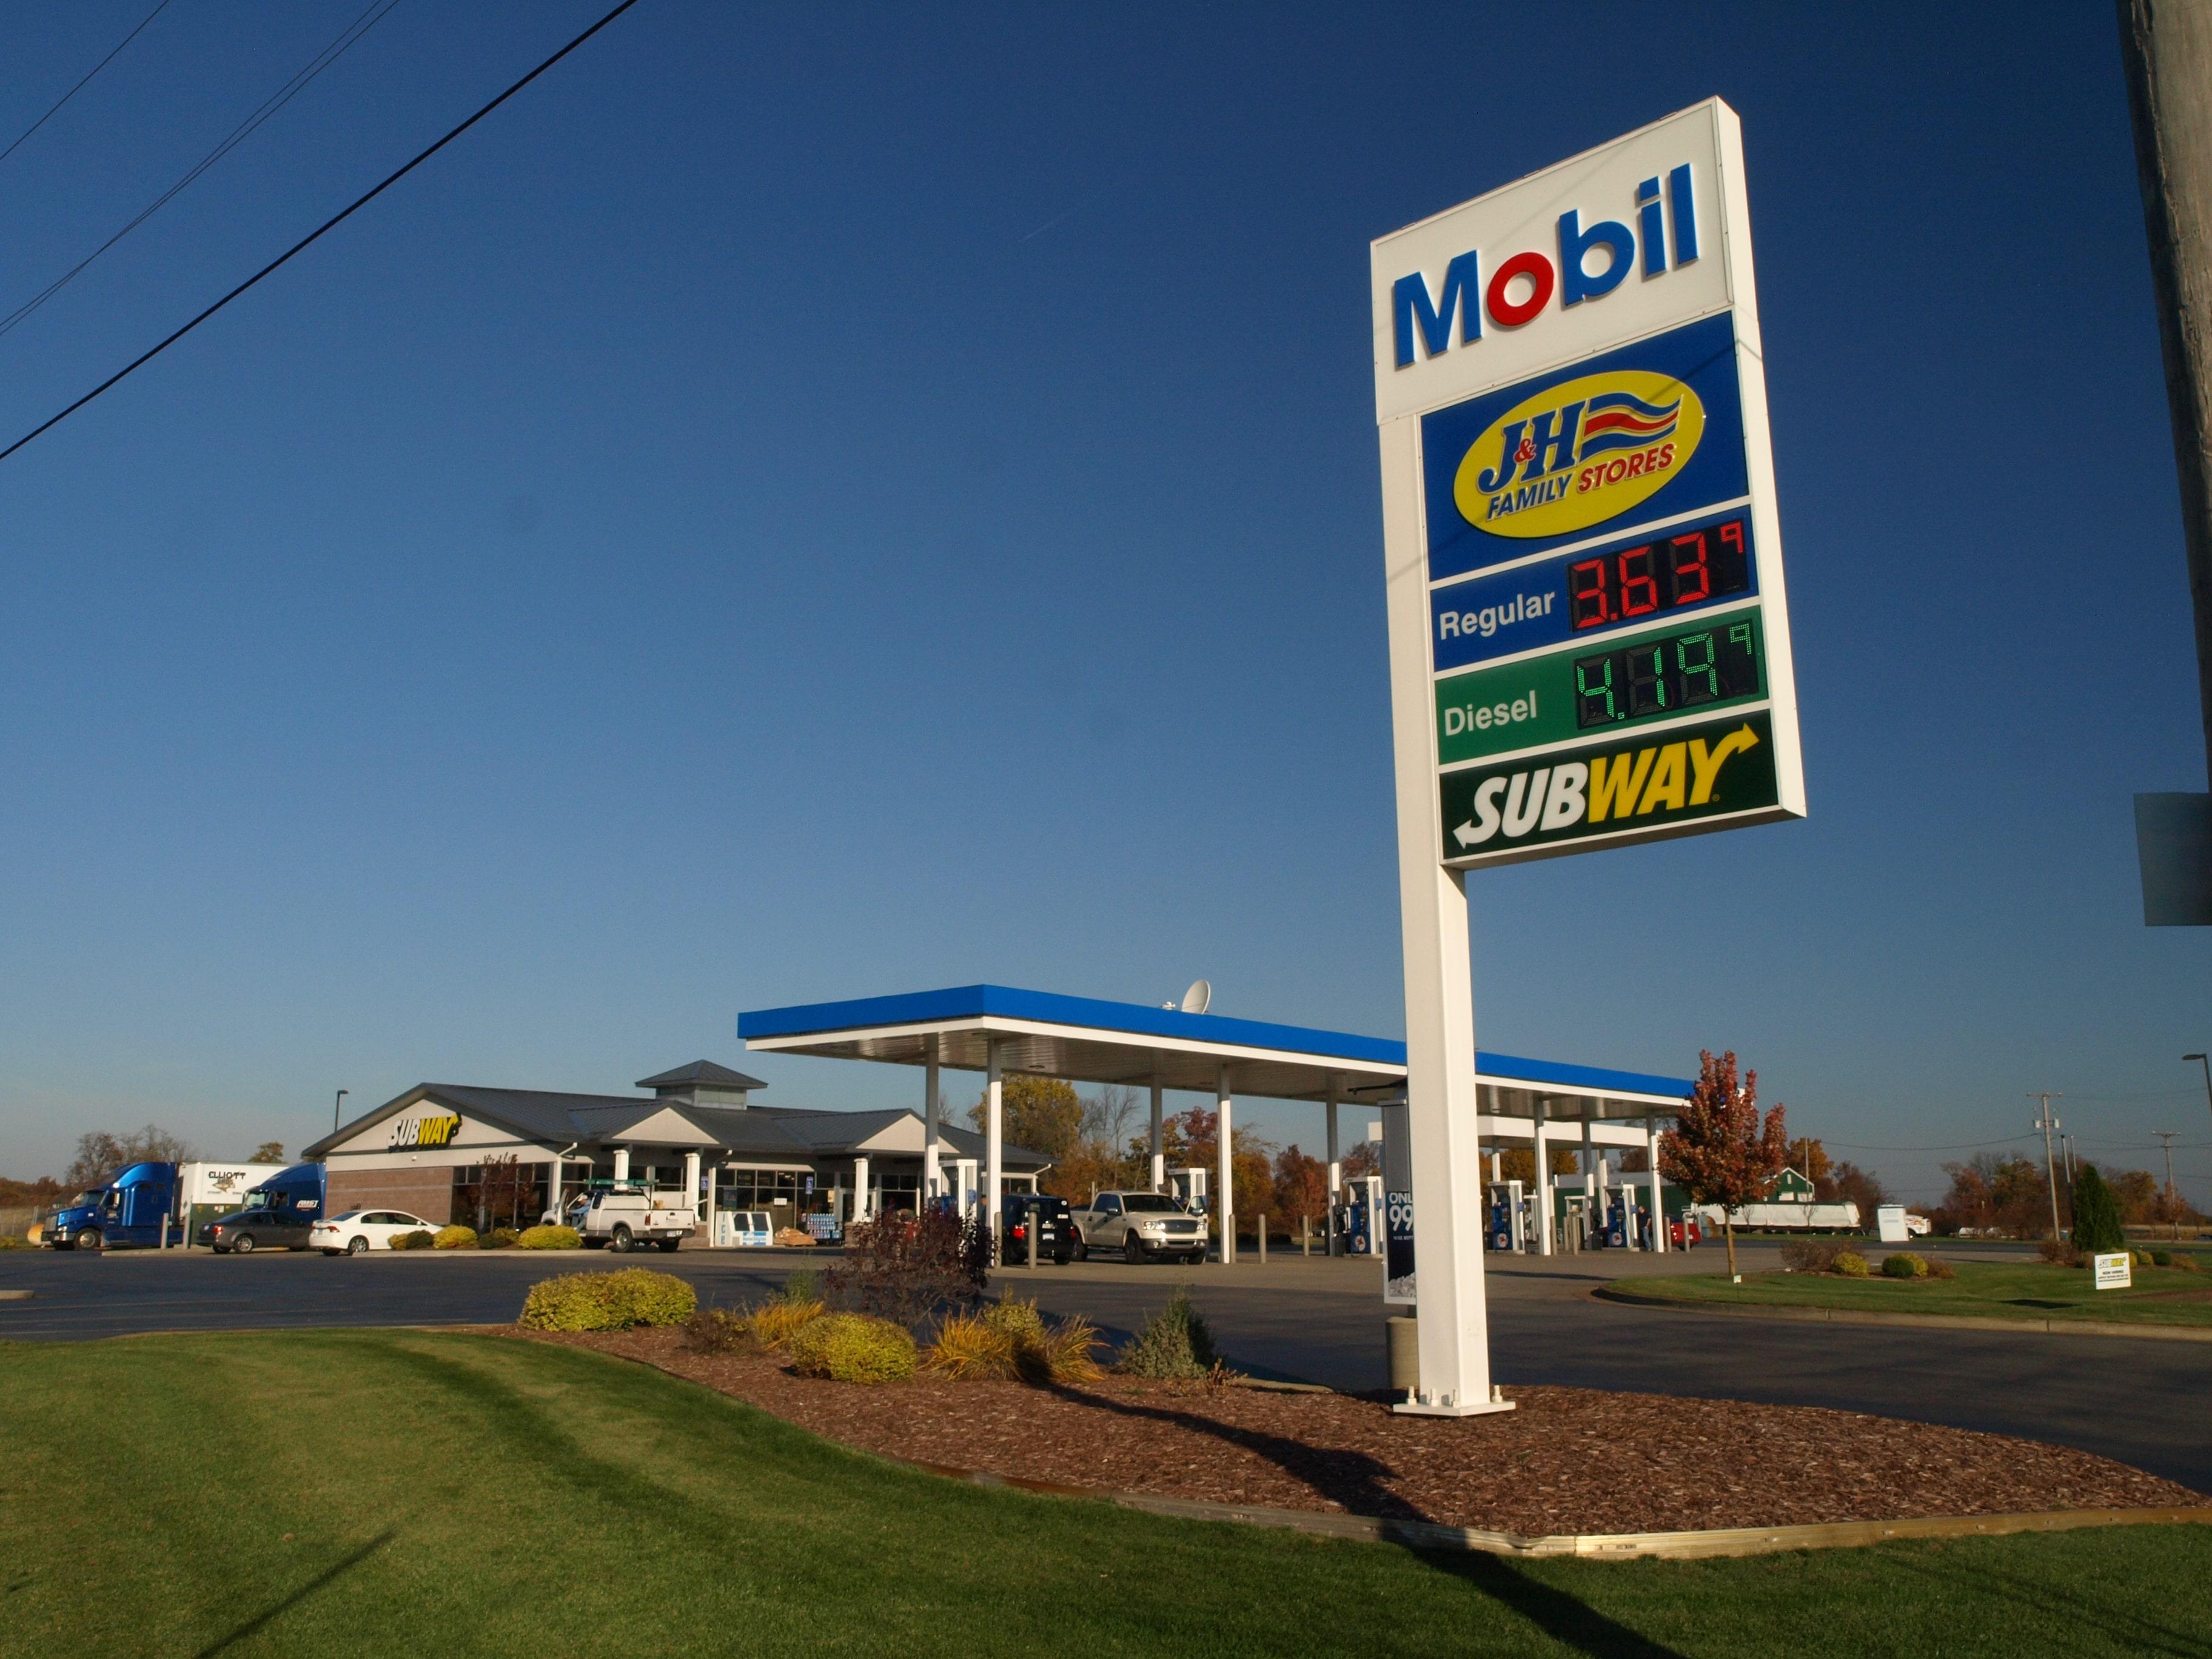 Nearest Mobil Gas Station >> 4475 Alden Nash Lowell Mi 49331 Lowell Mobil J H